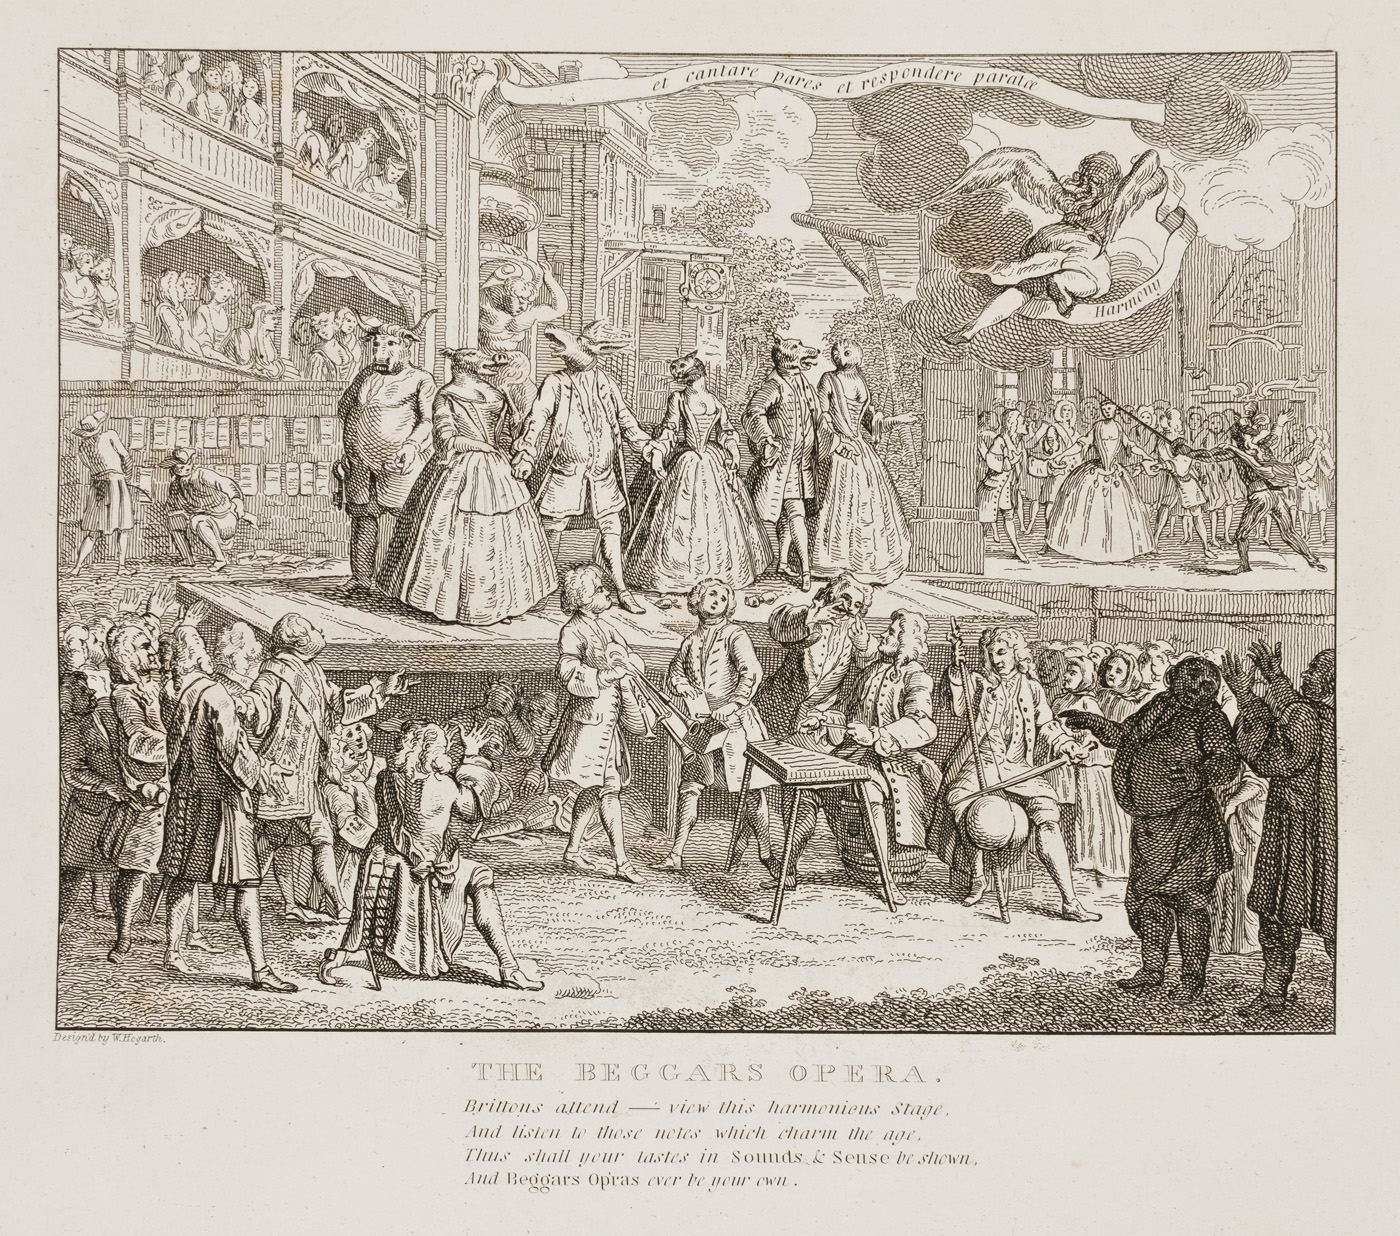 William Hogarth - Beggars' Opera Burlesqued